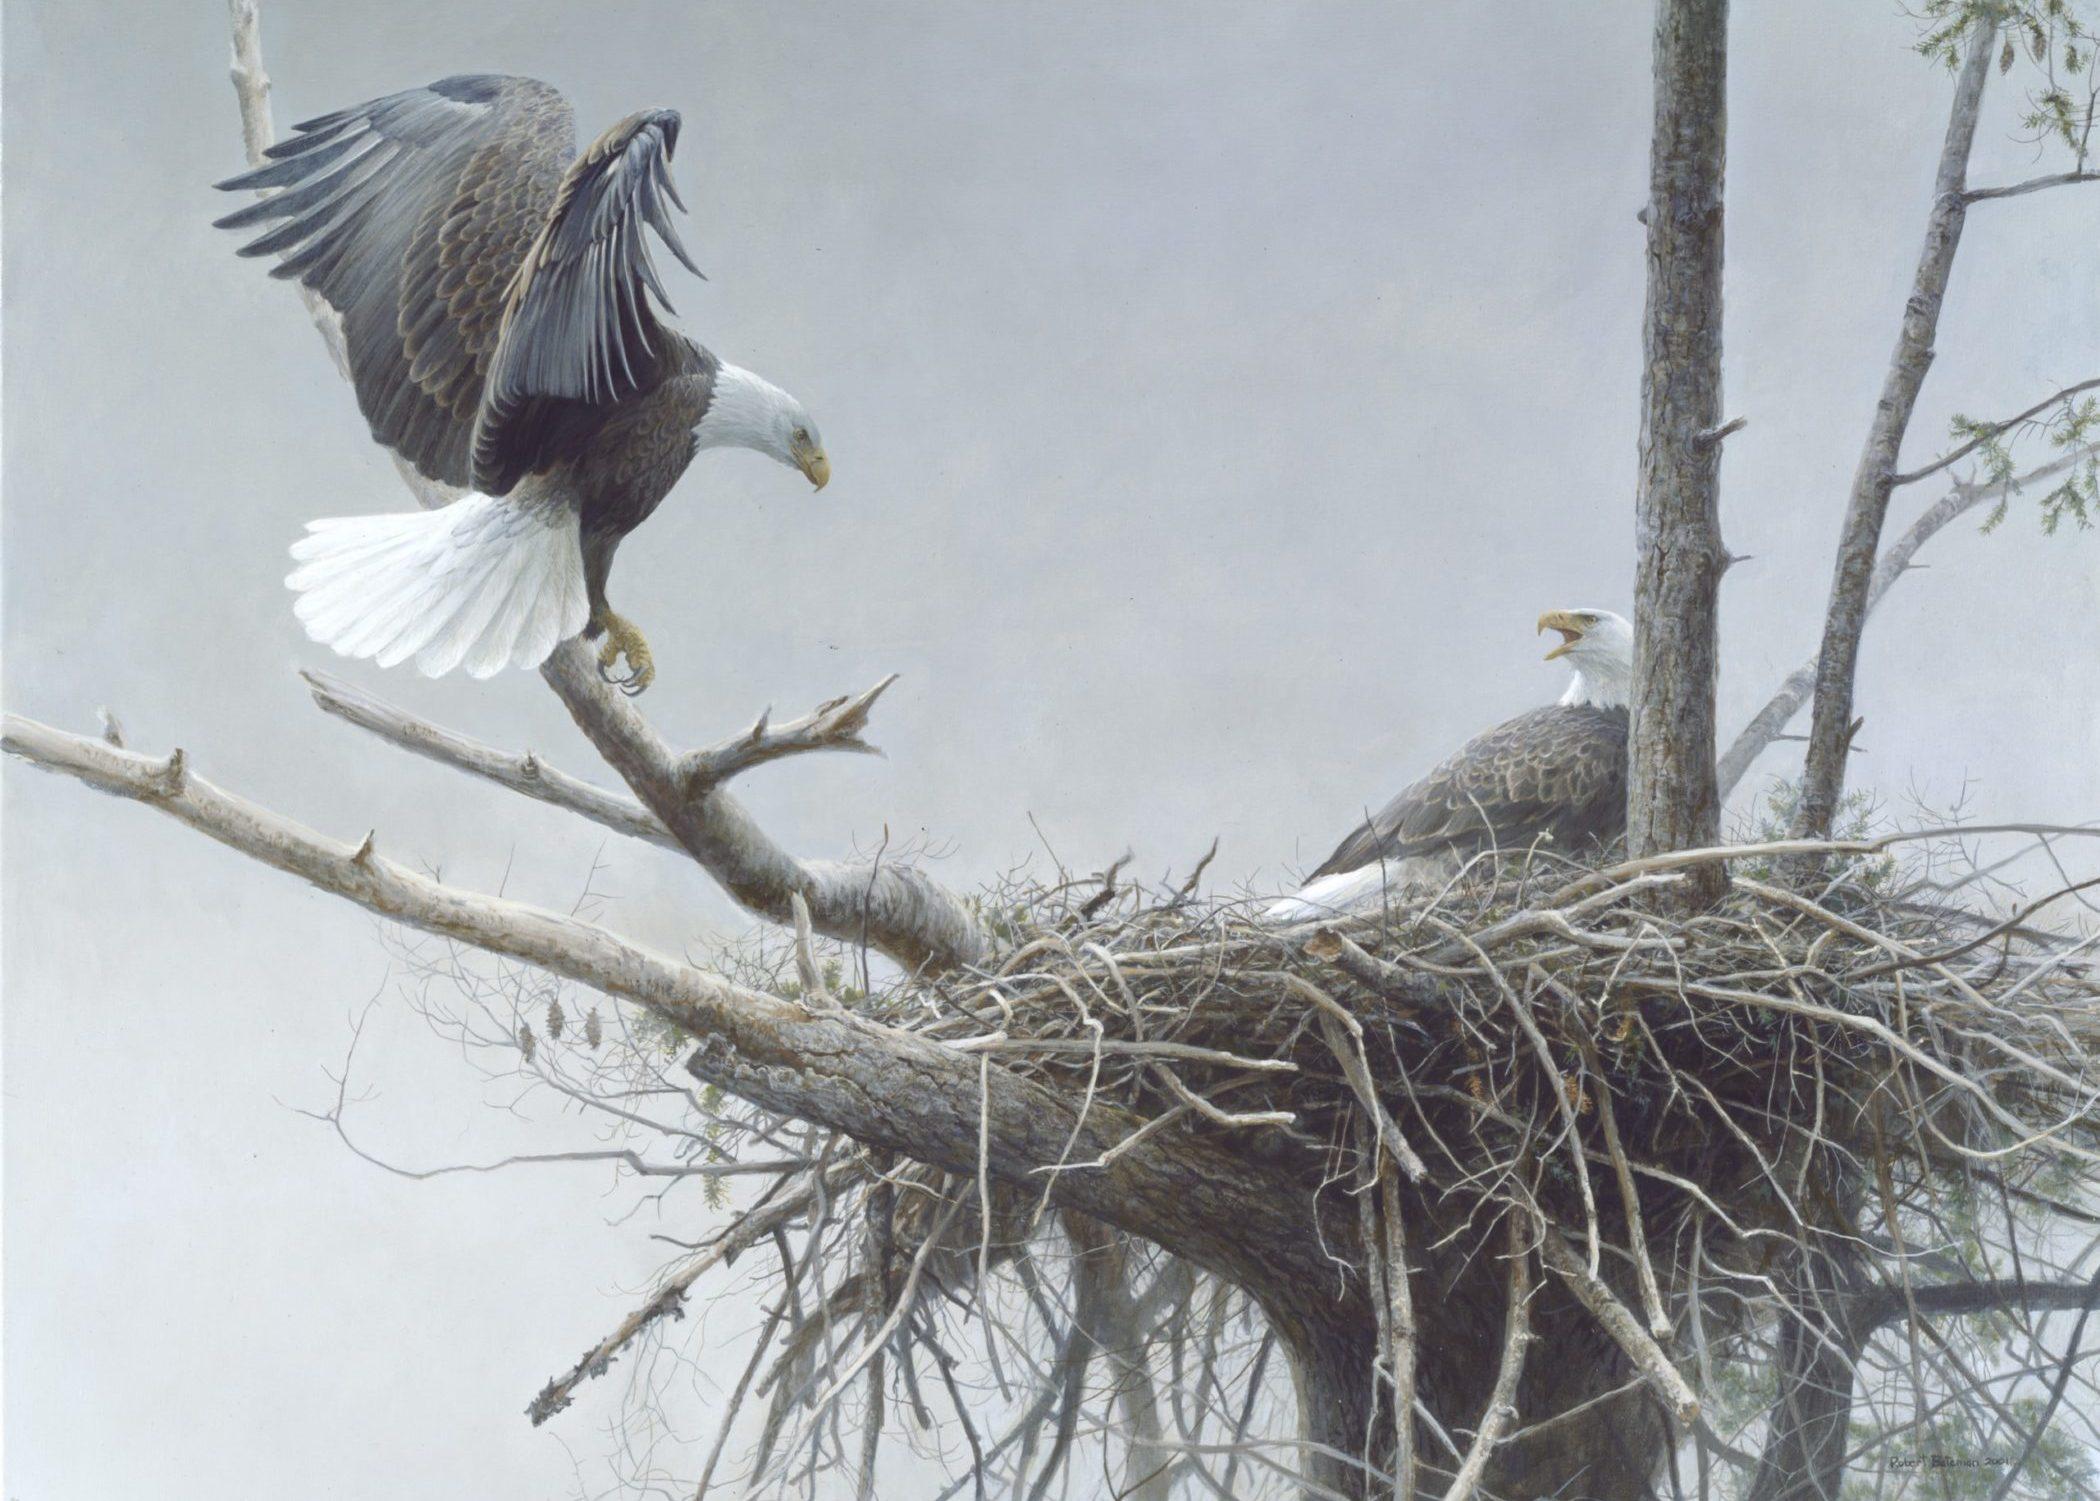 Robert Bateman, The Return – Bald Eagle, Pair